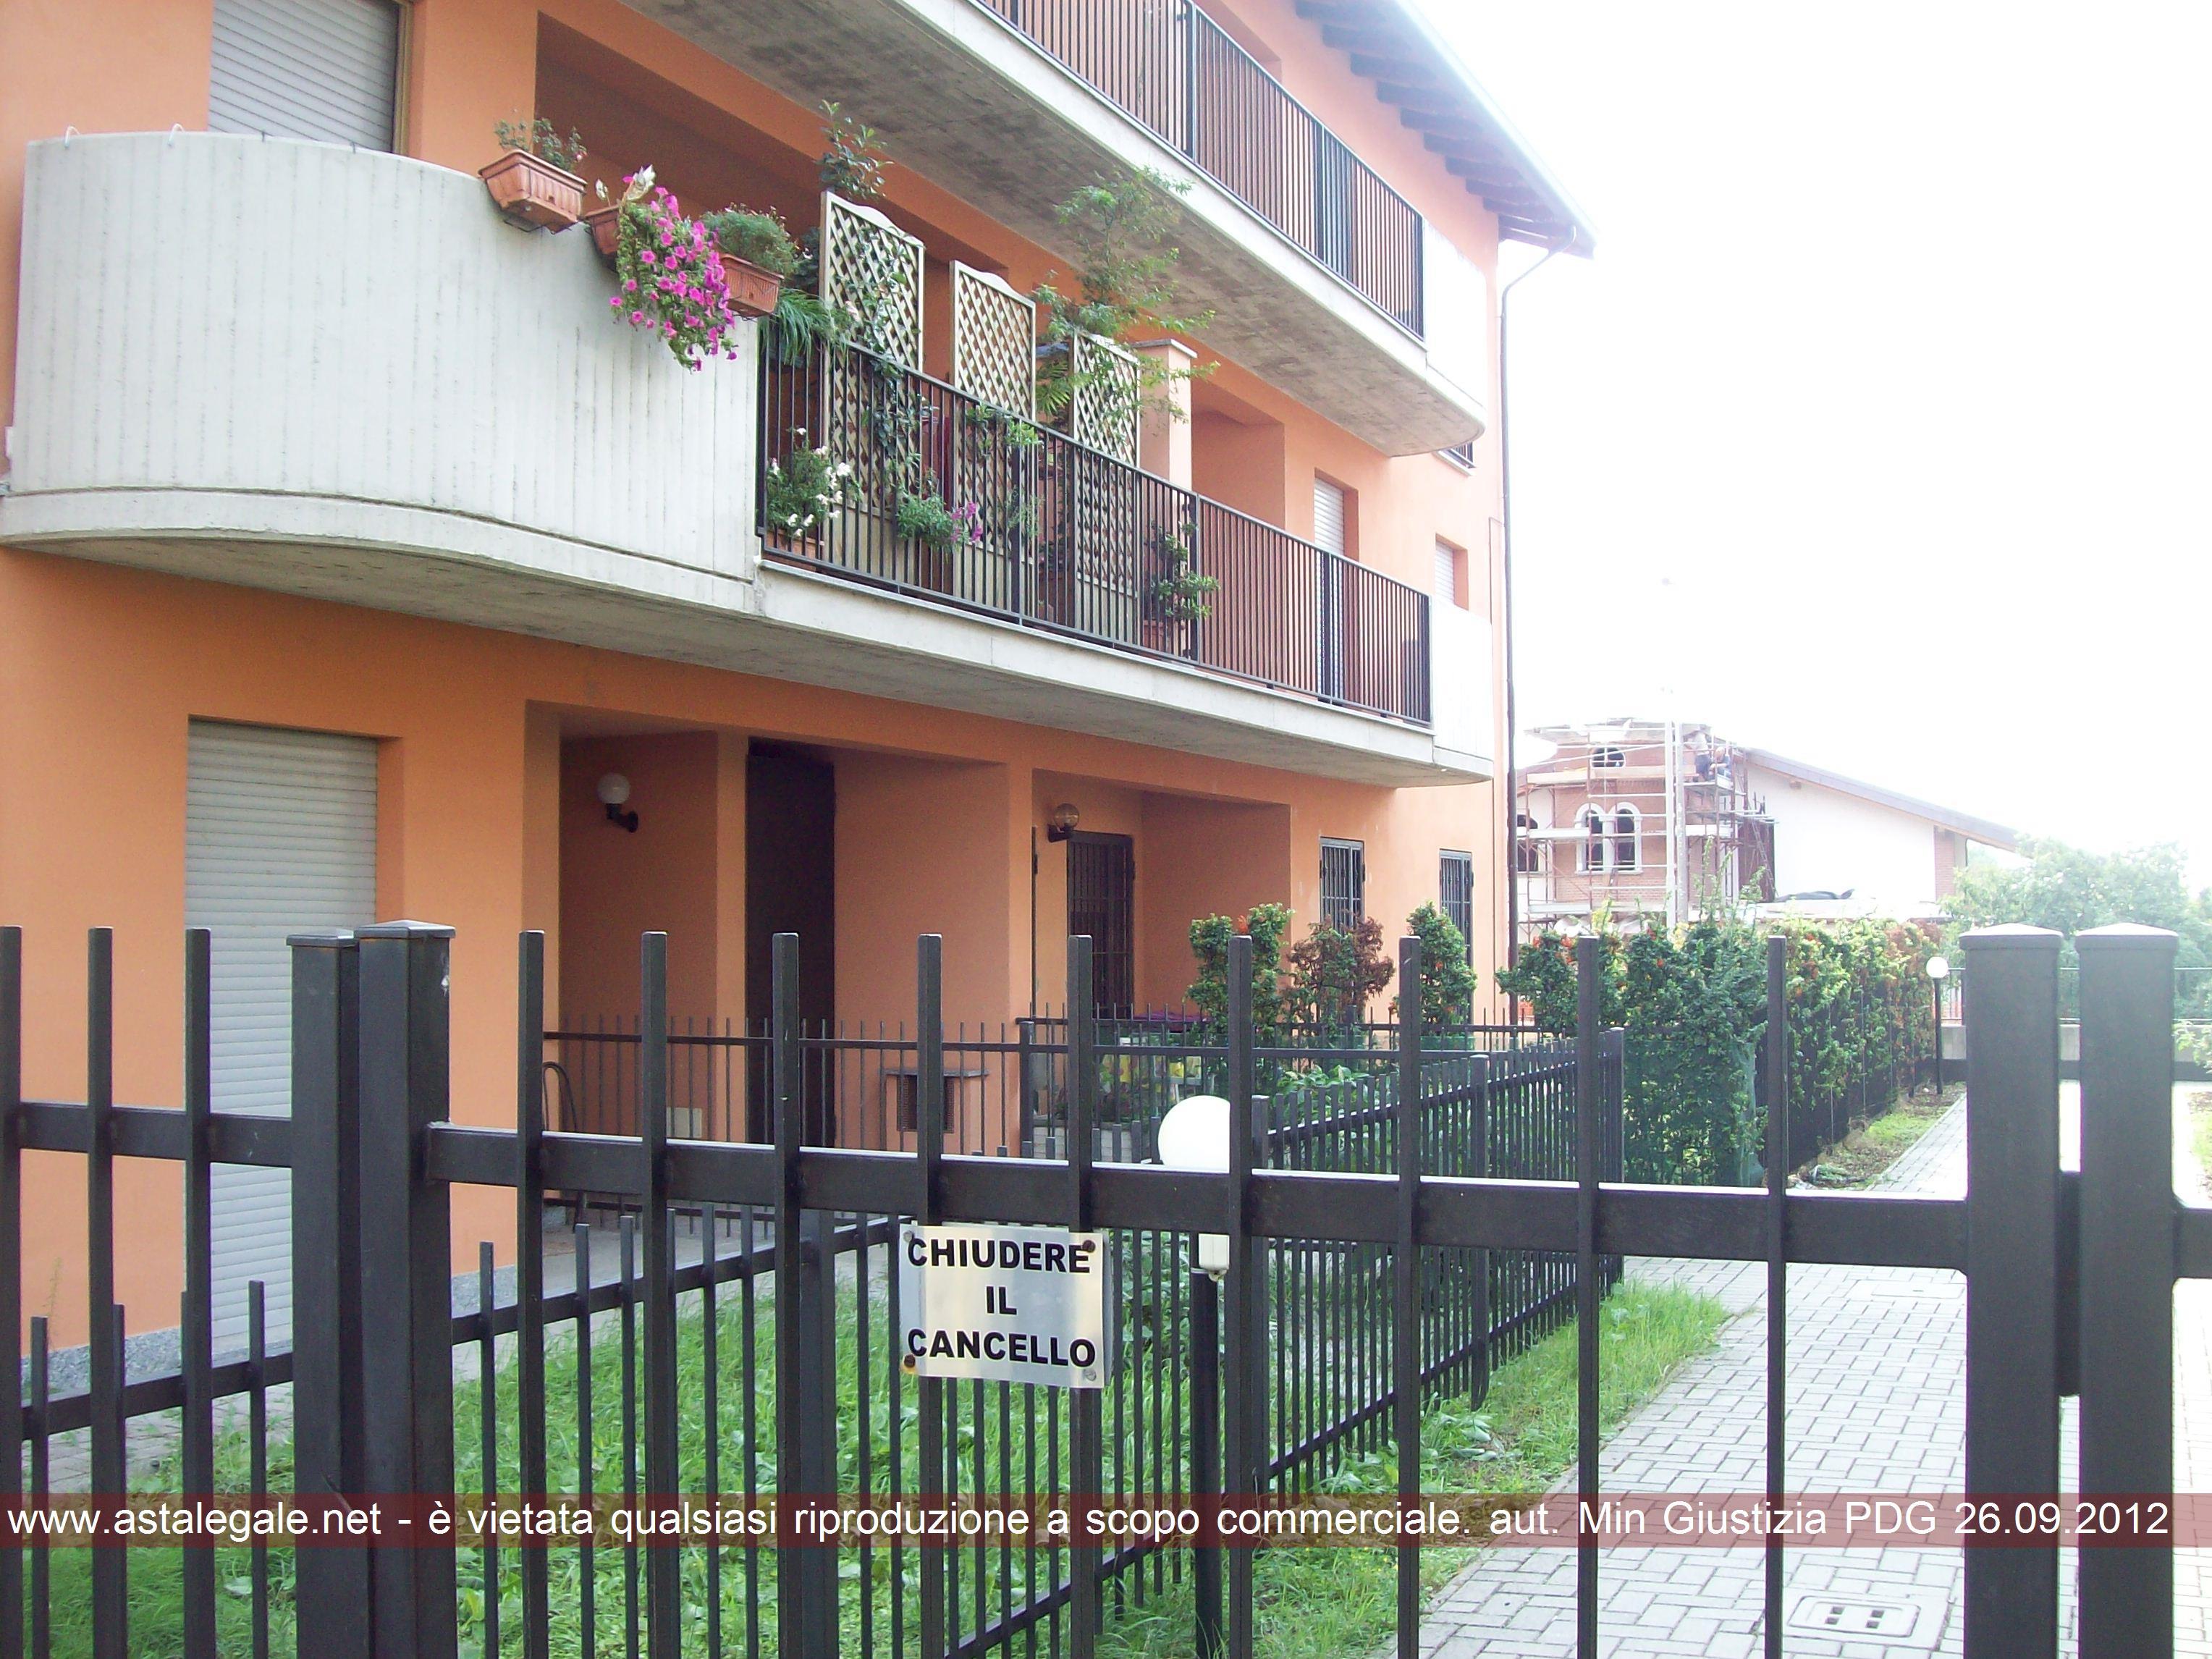 Cassolnovo (PV) Via Naviglietto 6